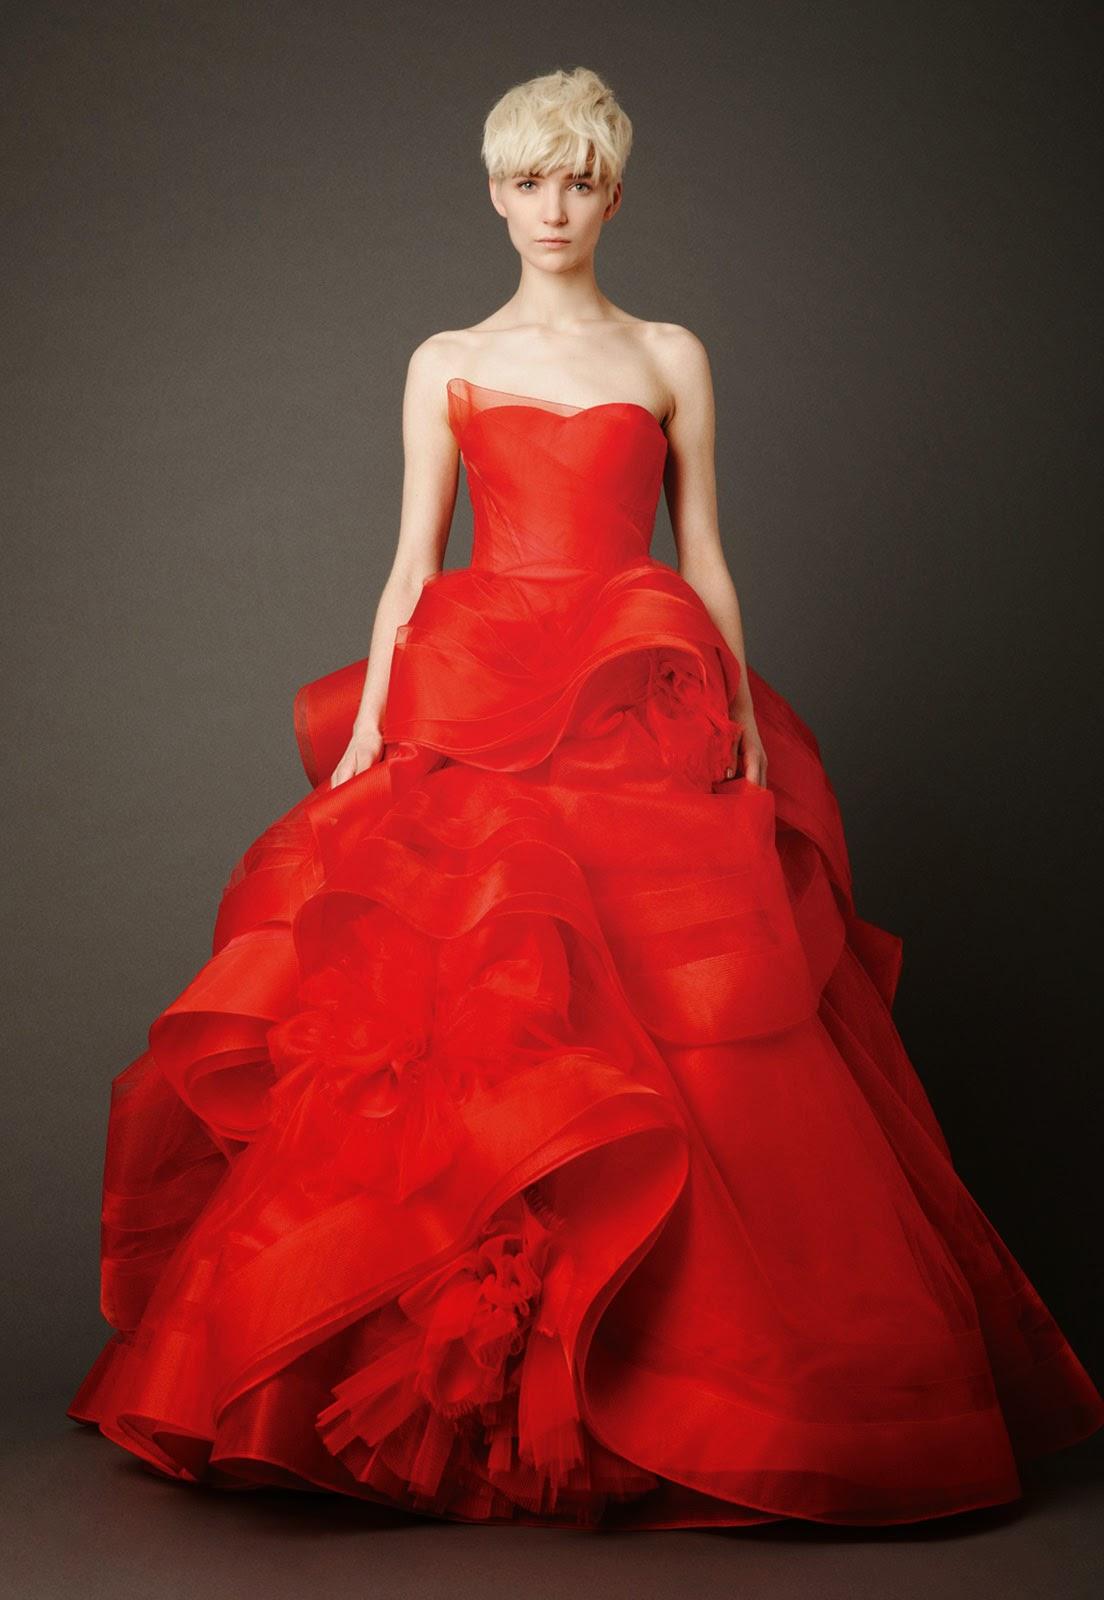 Best Red Wedding Dresses 2013 Design Ideas Photos HD